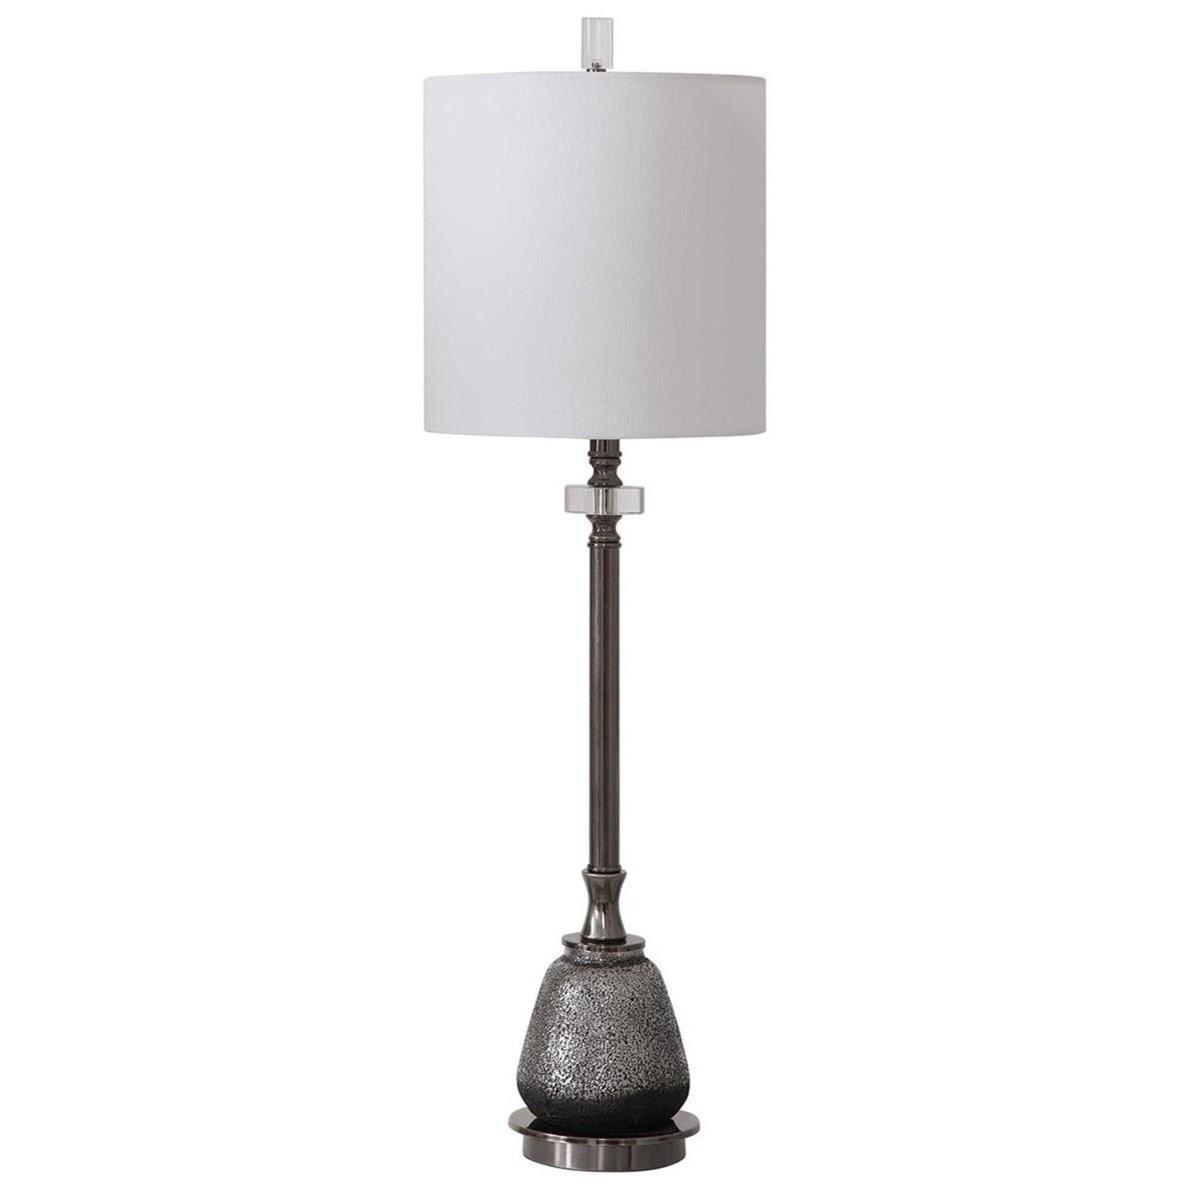 Rana Silver Buffet Lamp